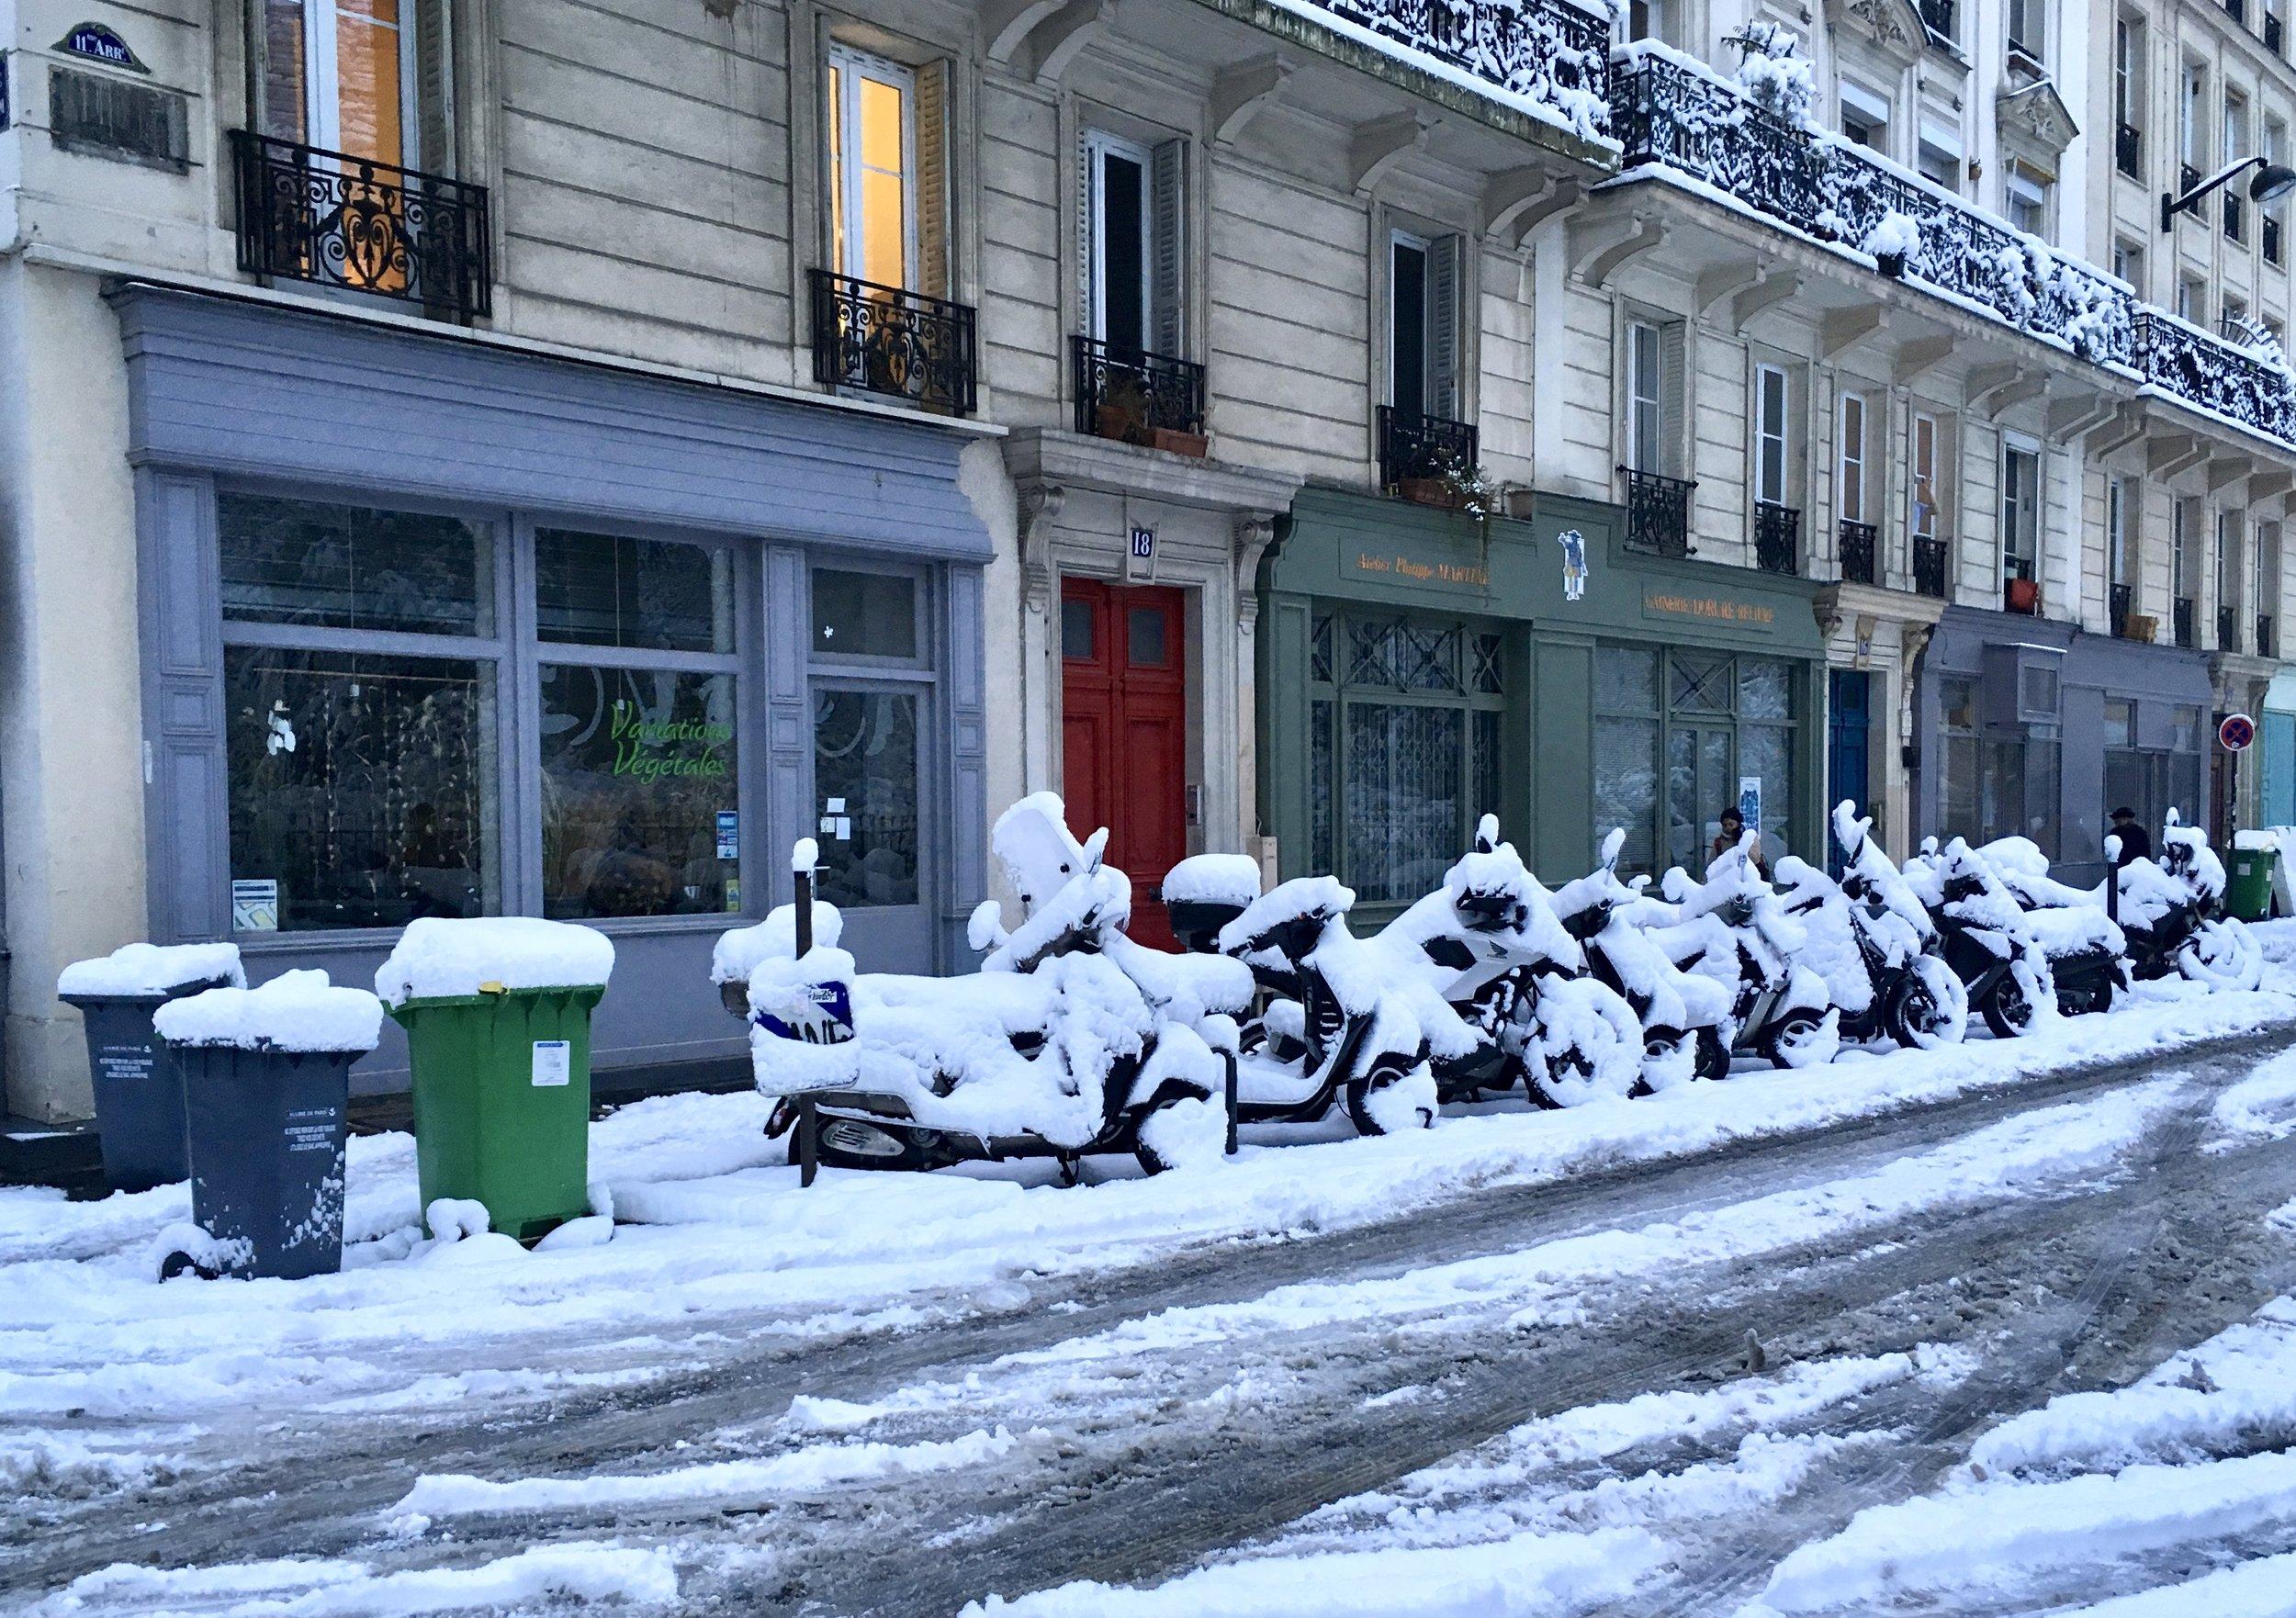 An unusual sight - snow in Paris.